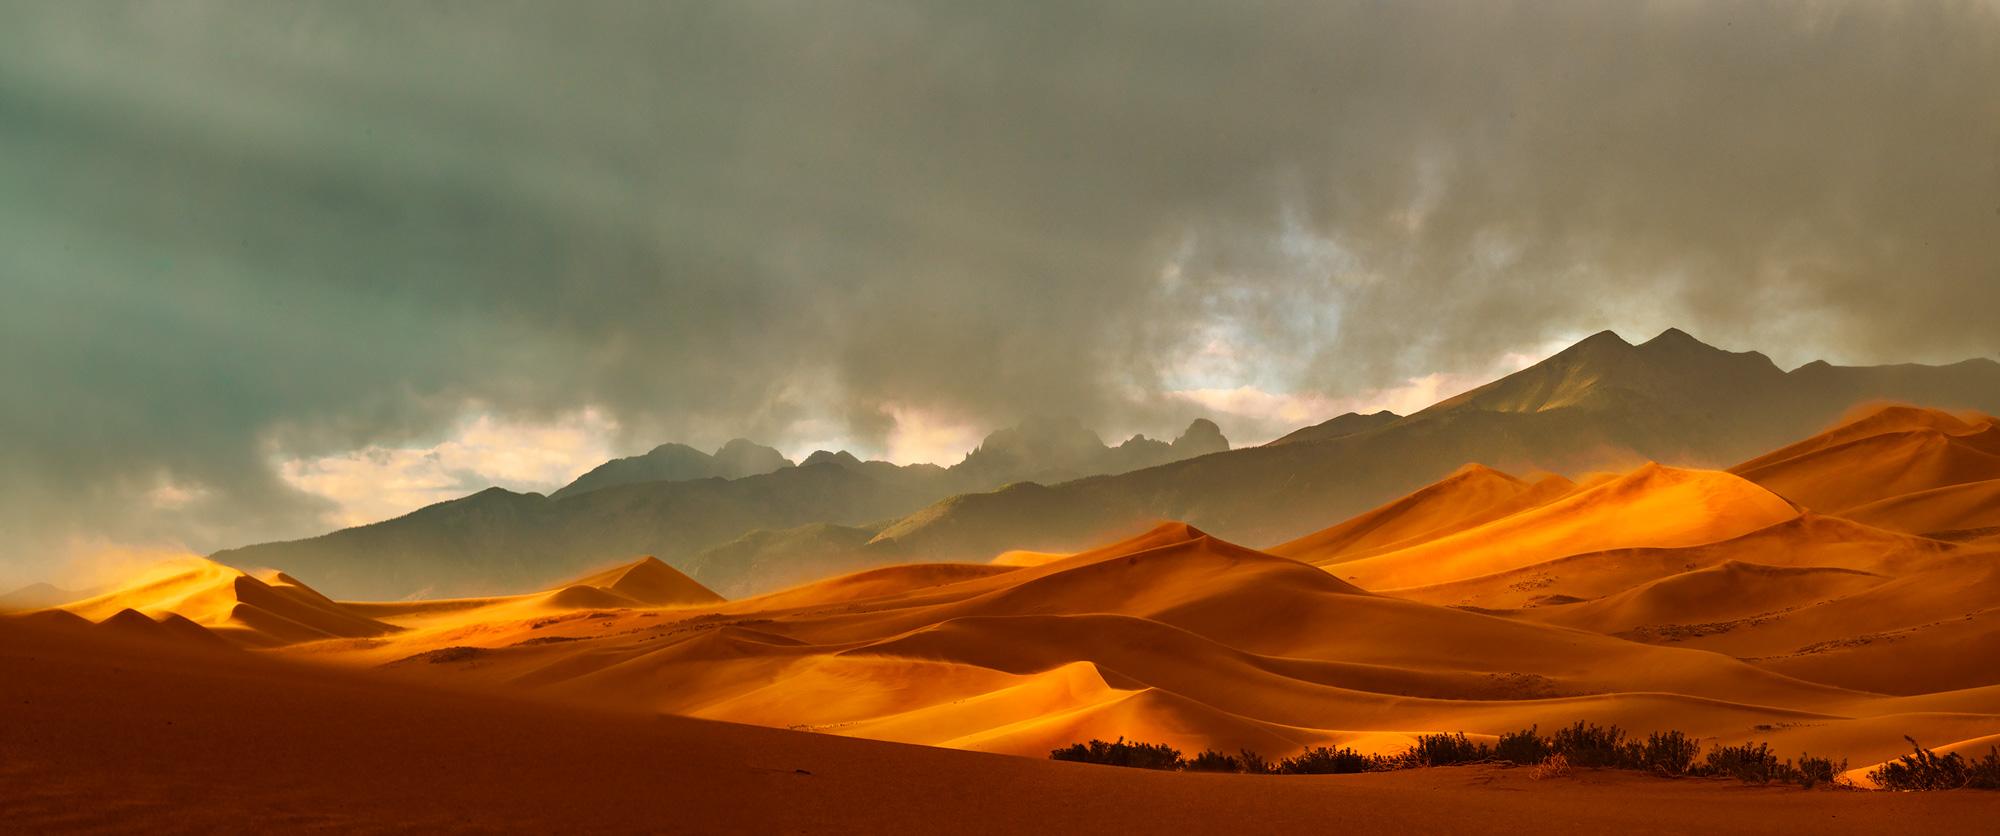 Great Sand Dunes National Park, Colorado, photo